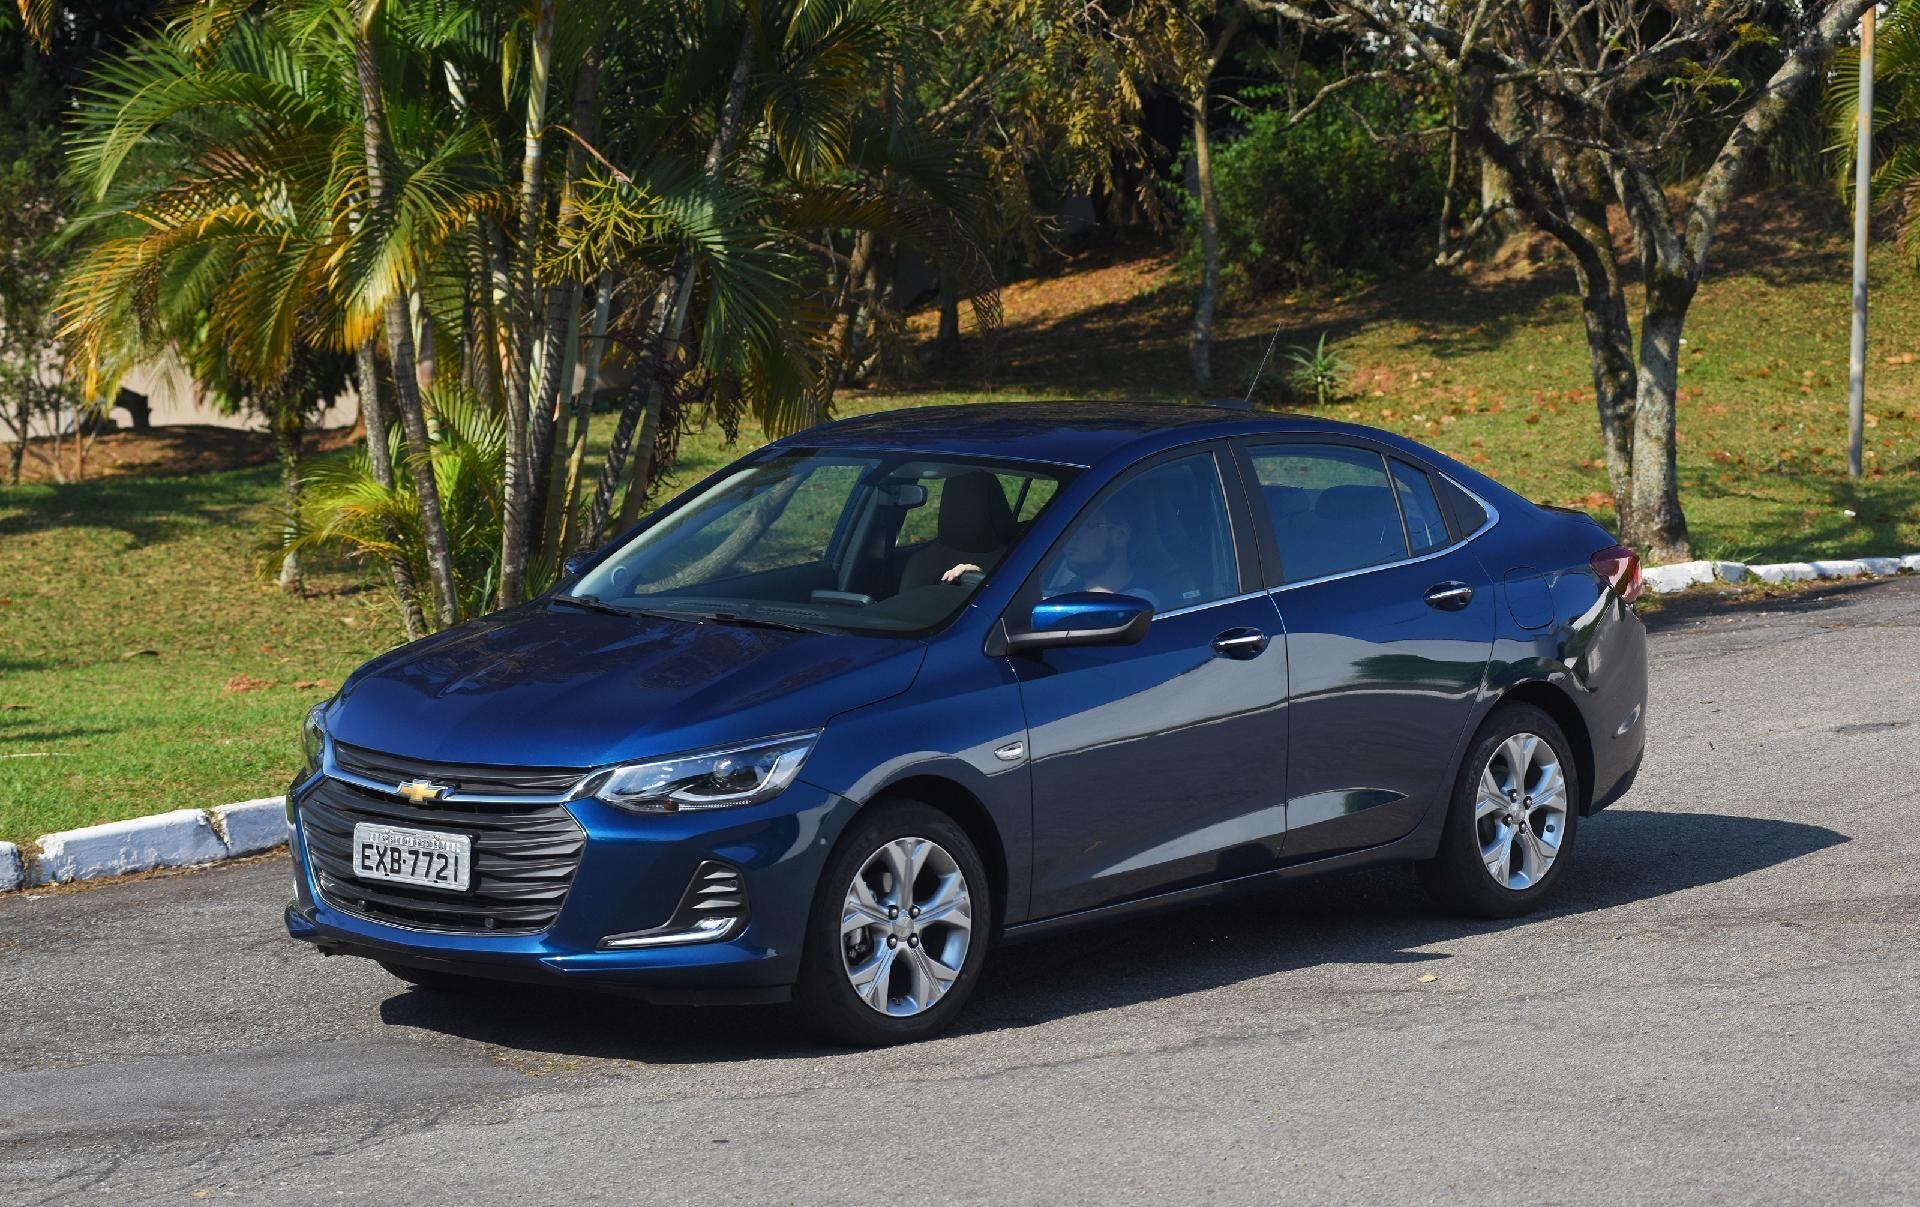 Chevrolet Onix Plus Premier Novo Seda Traz Motor 1 0 Turbo E Bom Conteudo Em 2020 General Motors Onix Motor